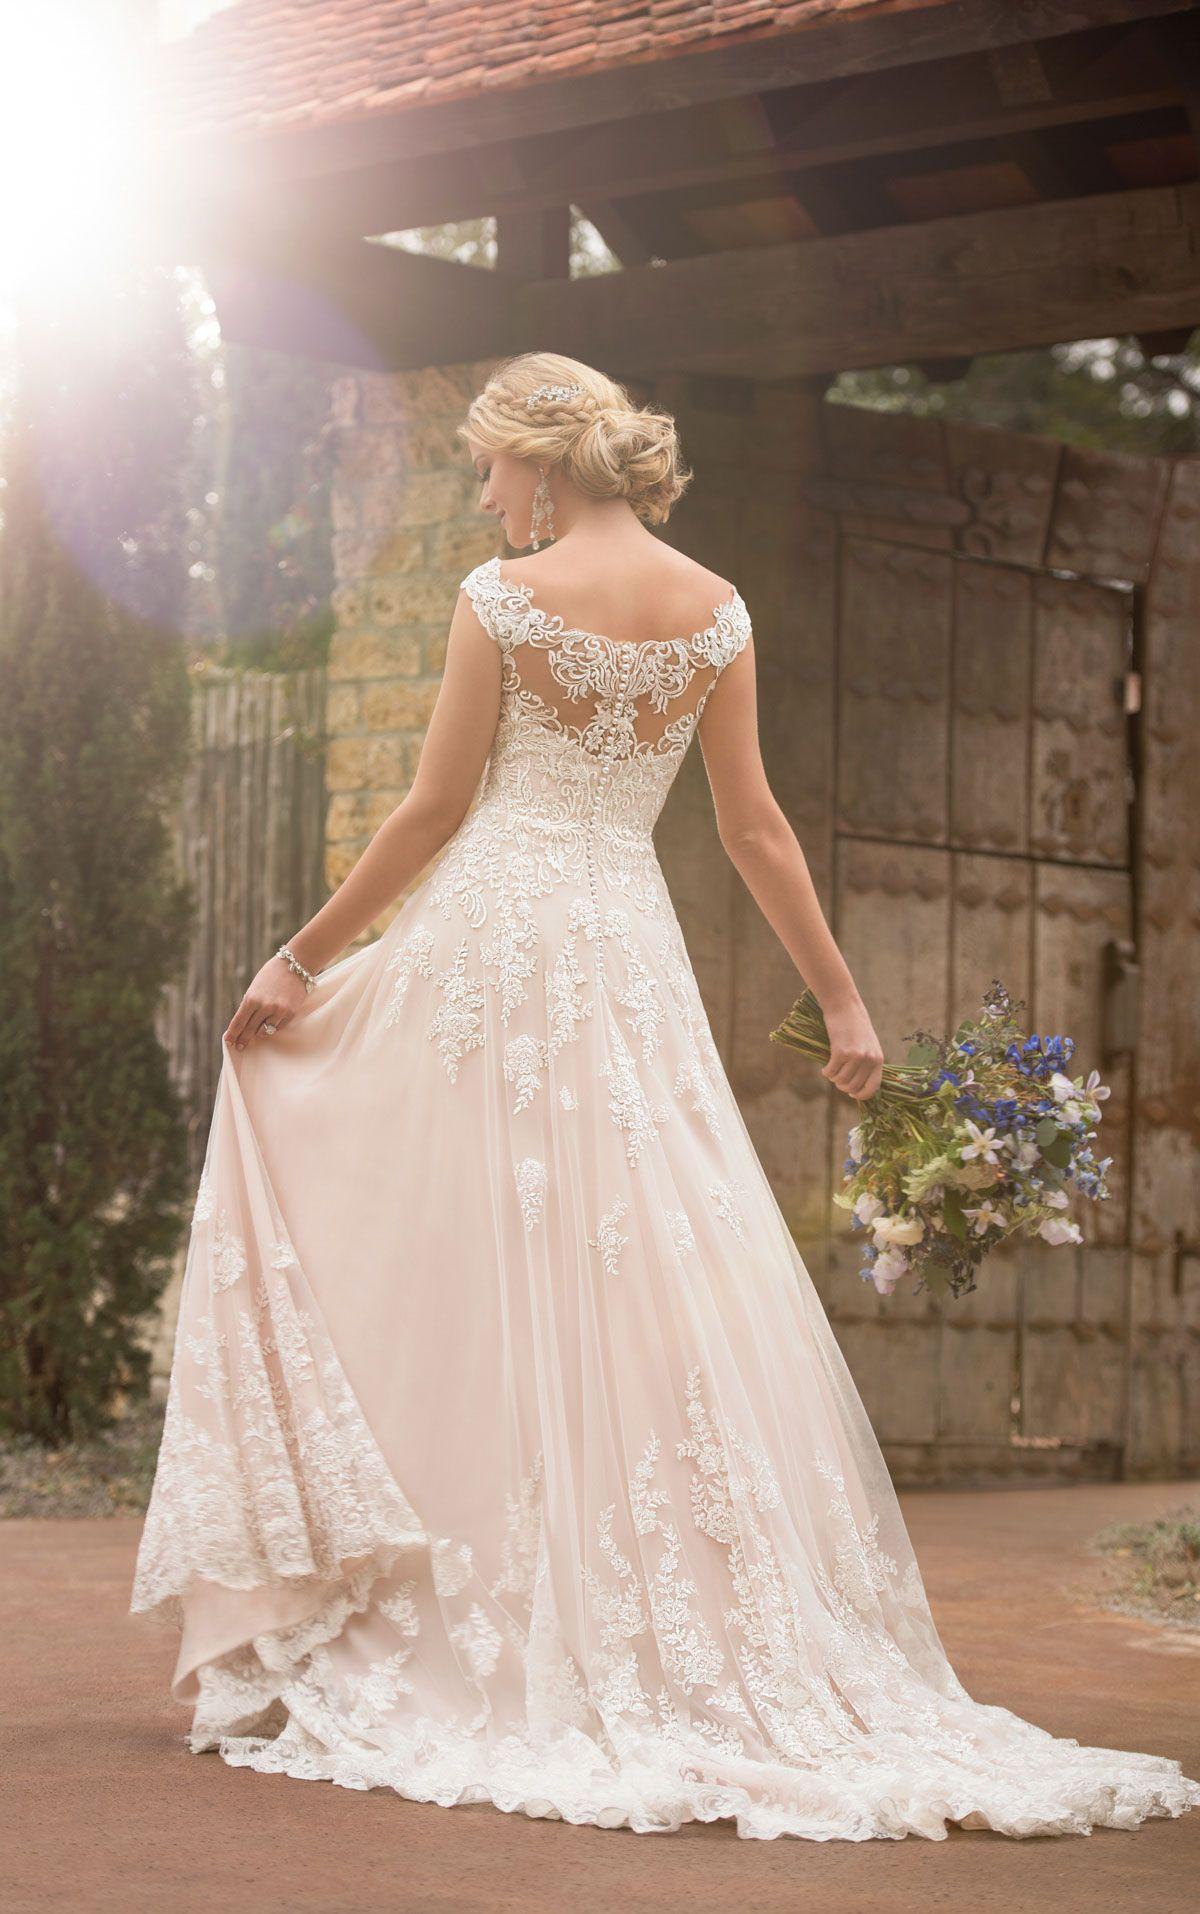 Boho wedding dresses i do pinterest shoulder sleeve neckline